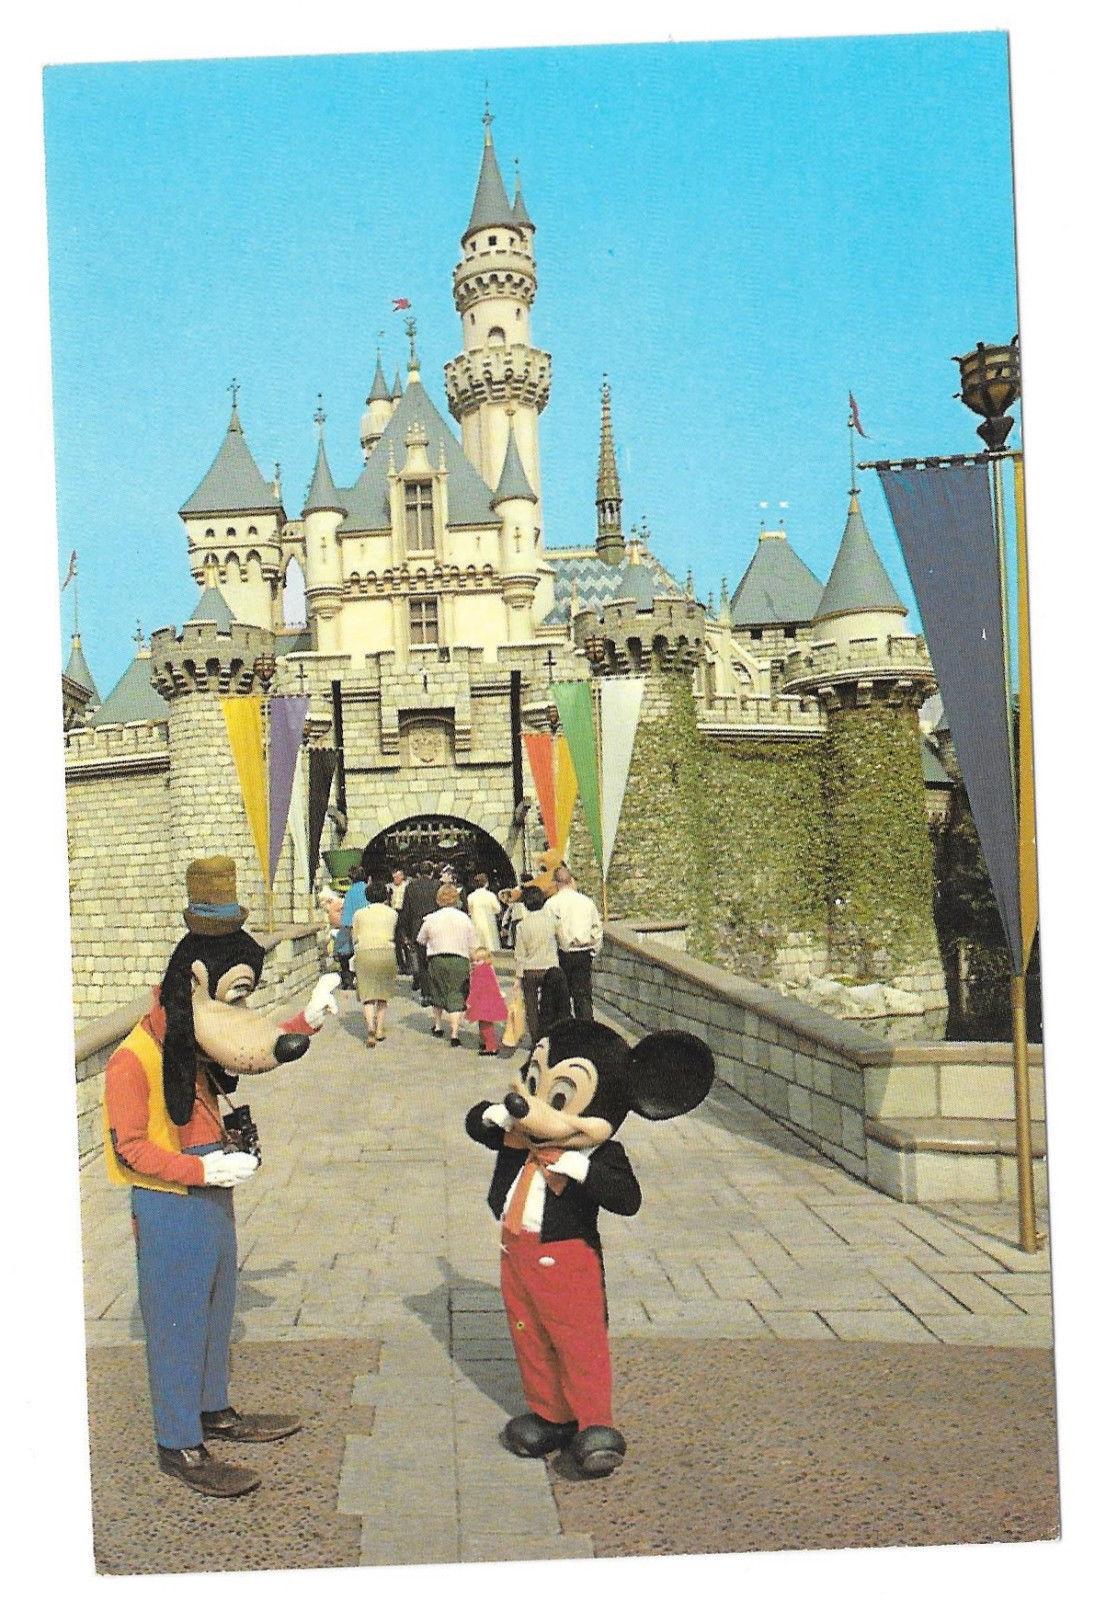 Disneyland Mickey Goofy Sleeping Beauty's Castle Fantasyland Vtg Postcard